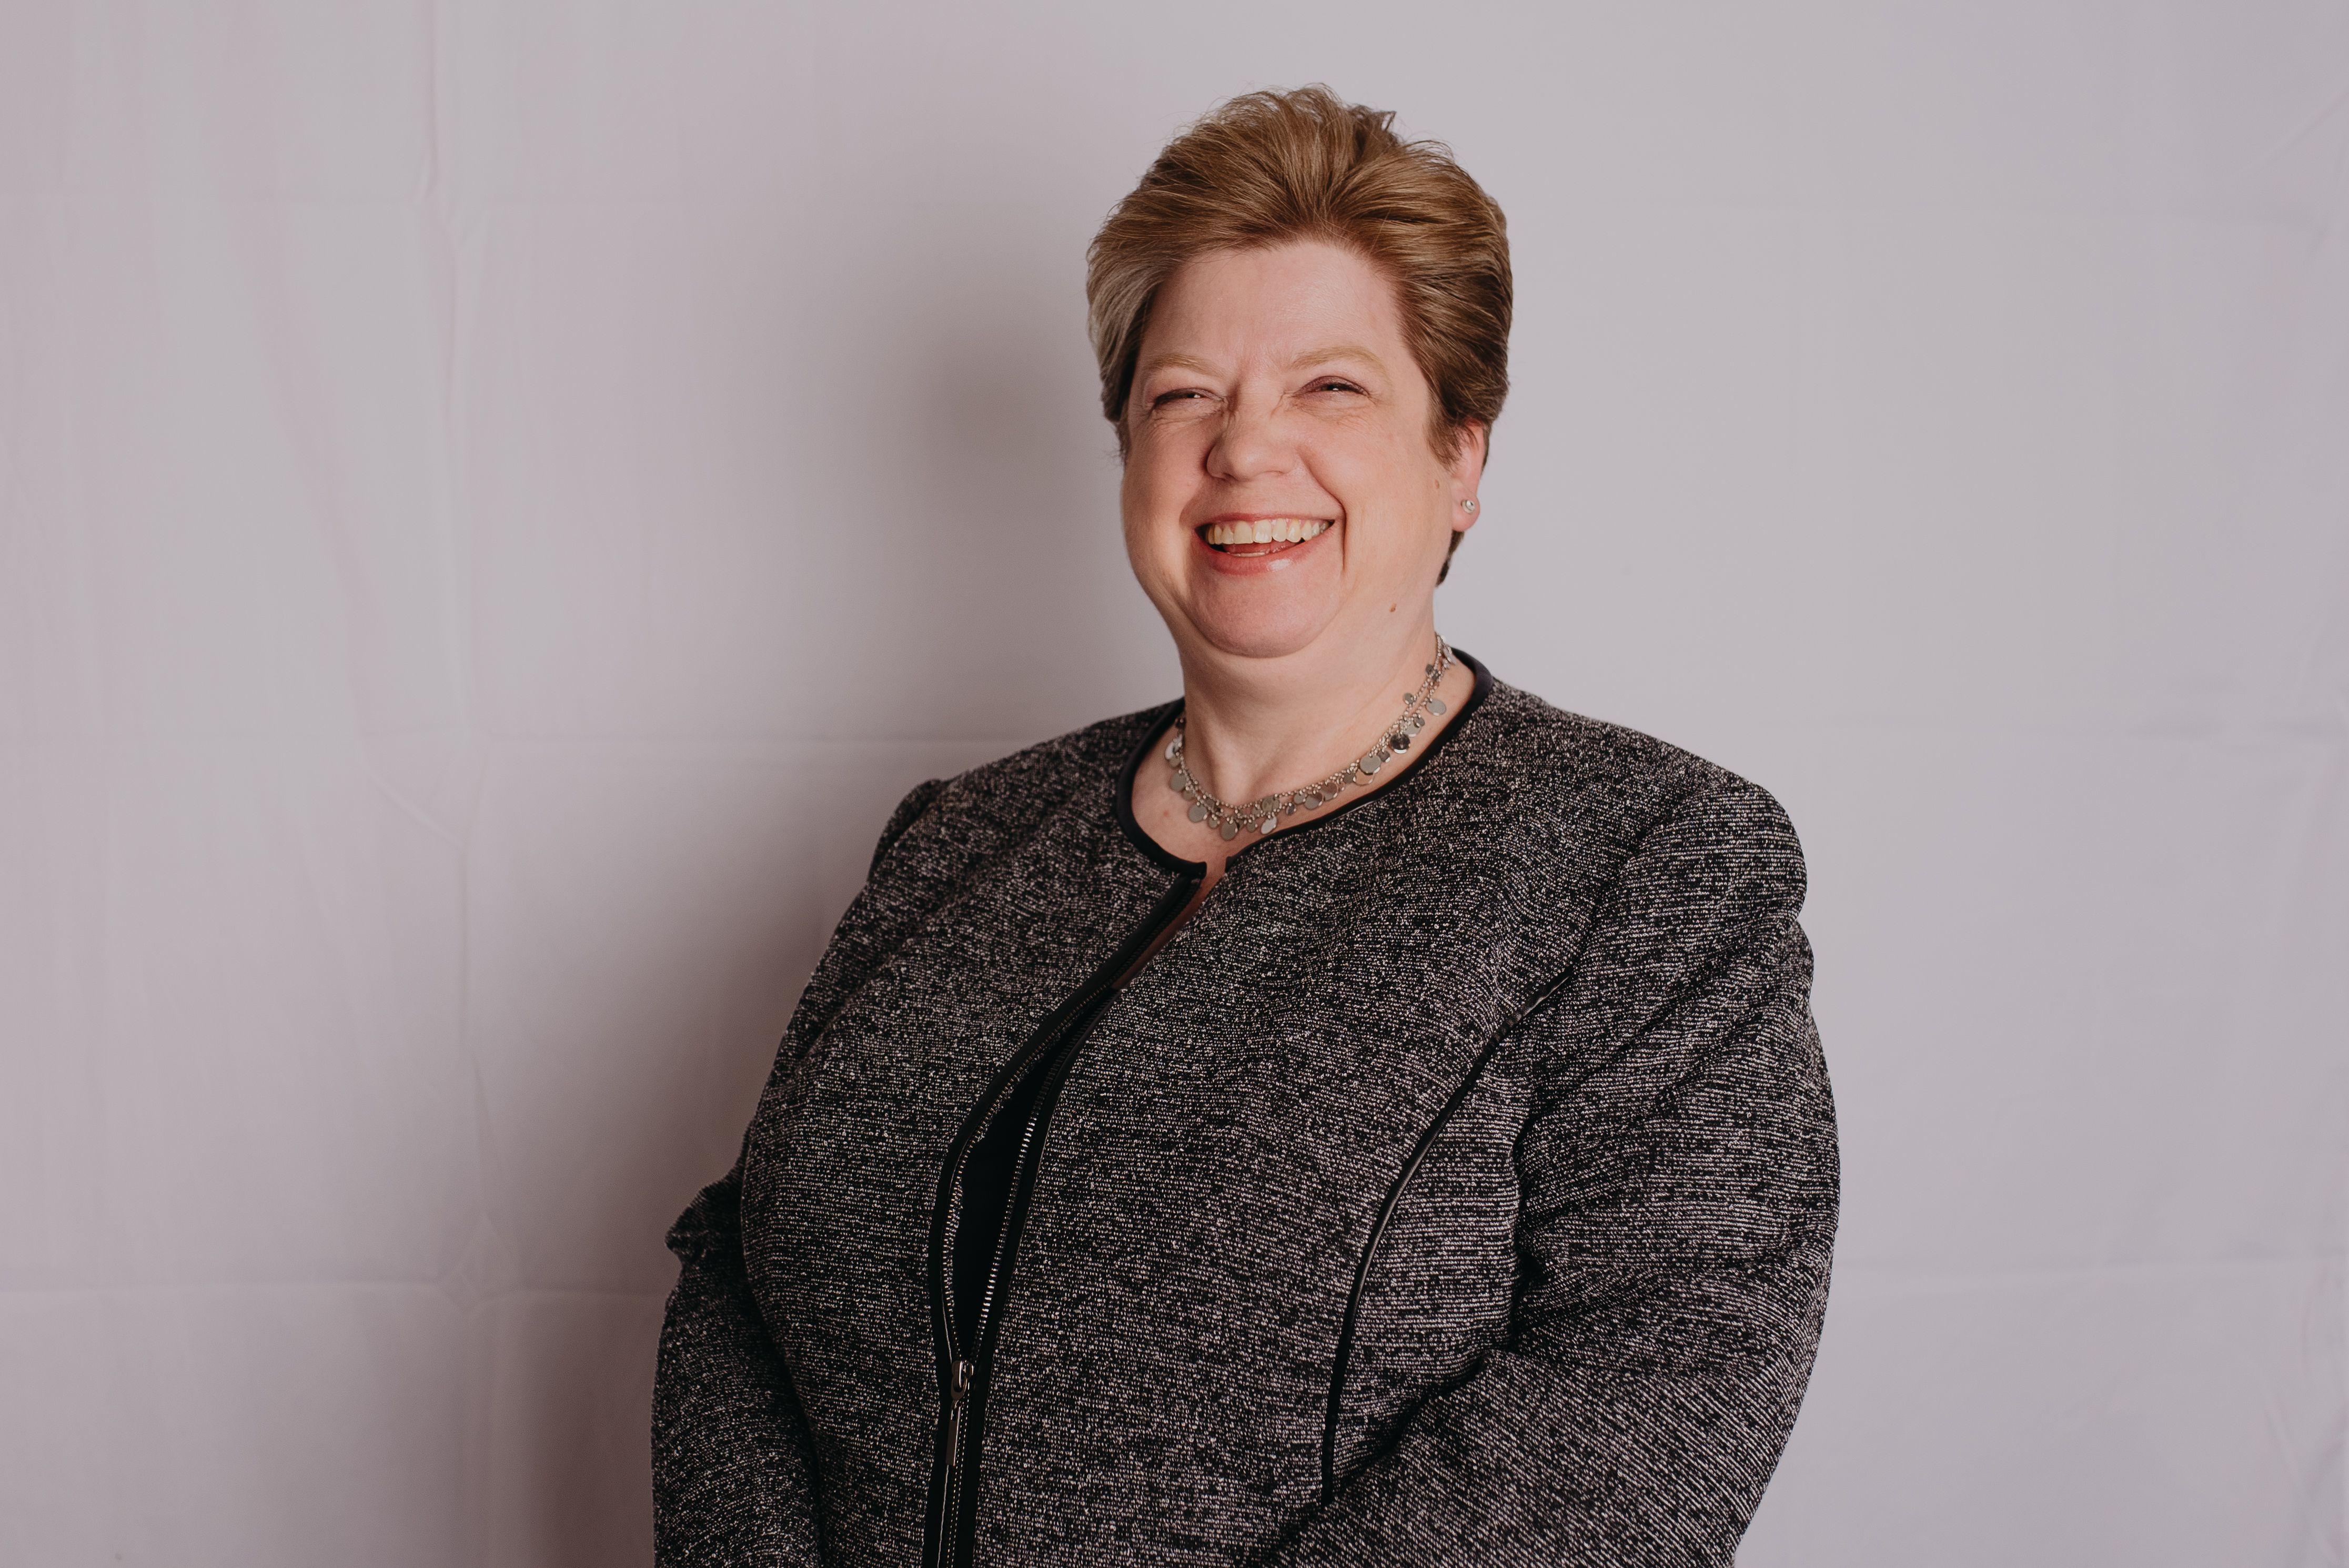 Andrea Stahl, Mutual of Omaha